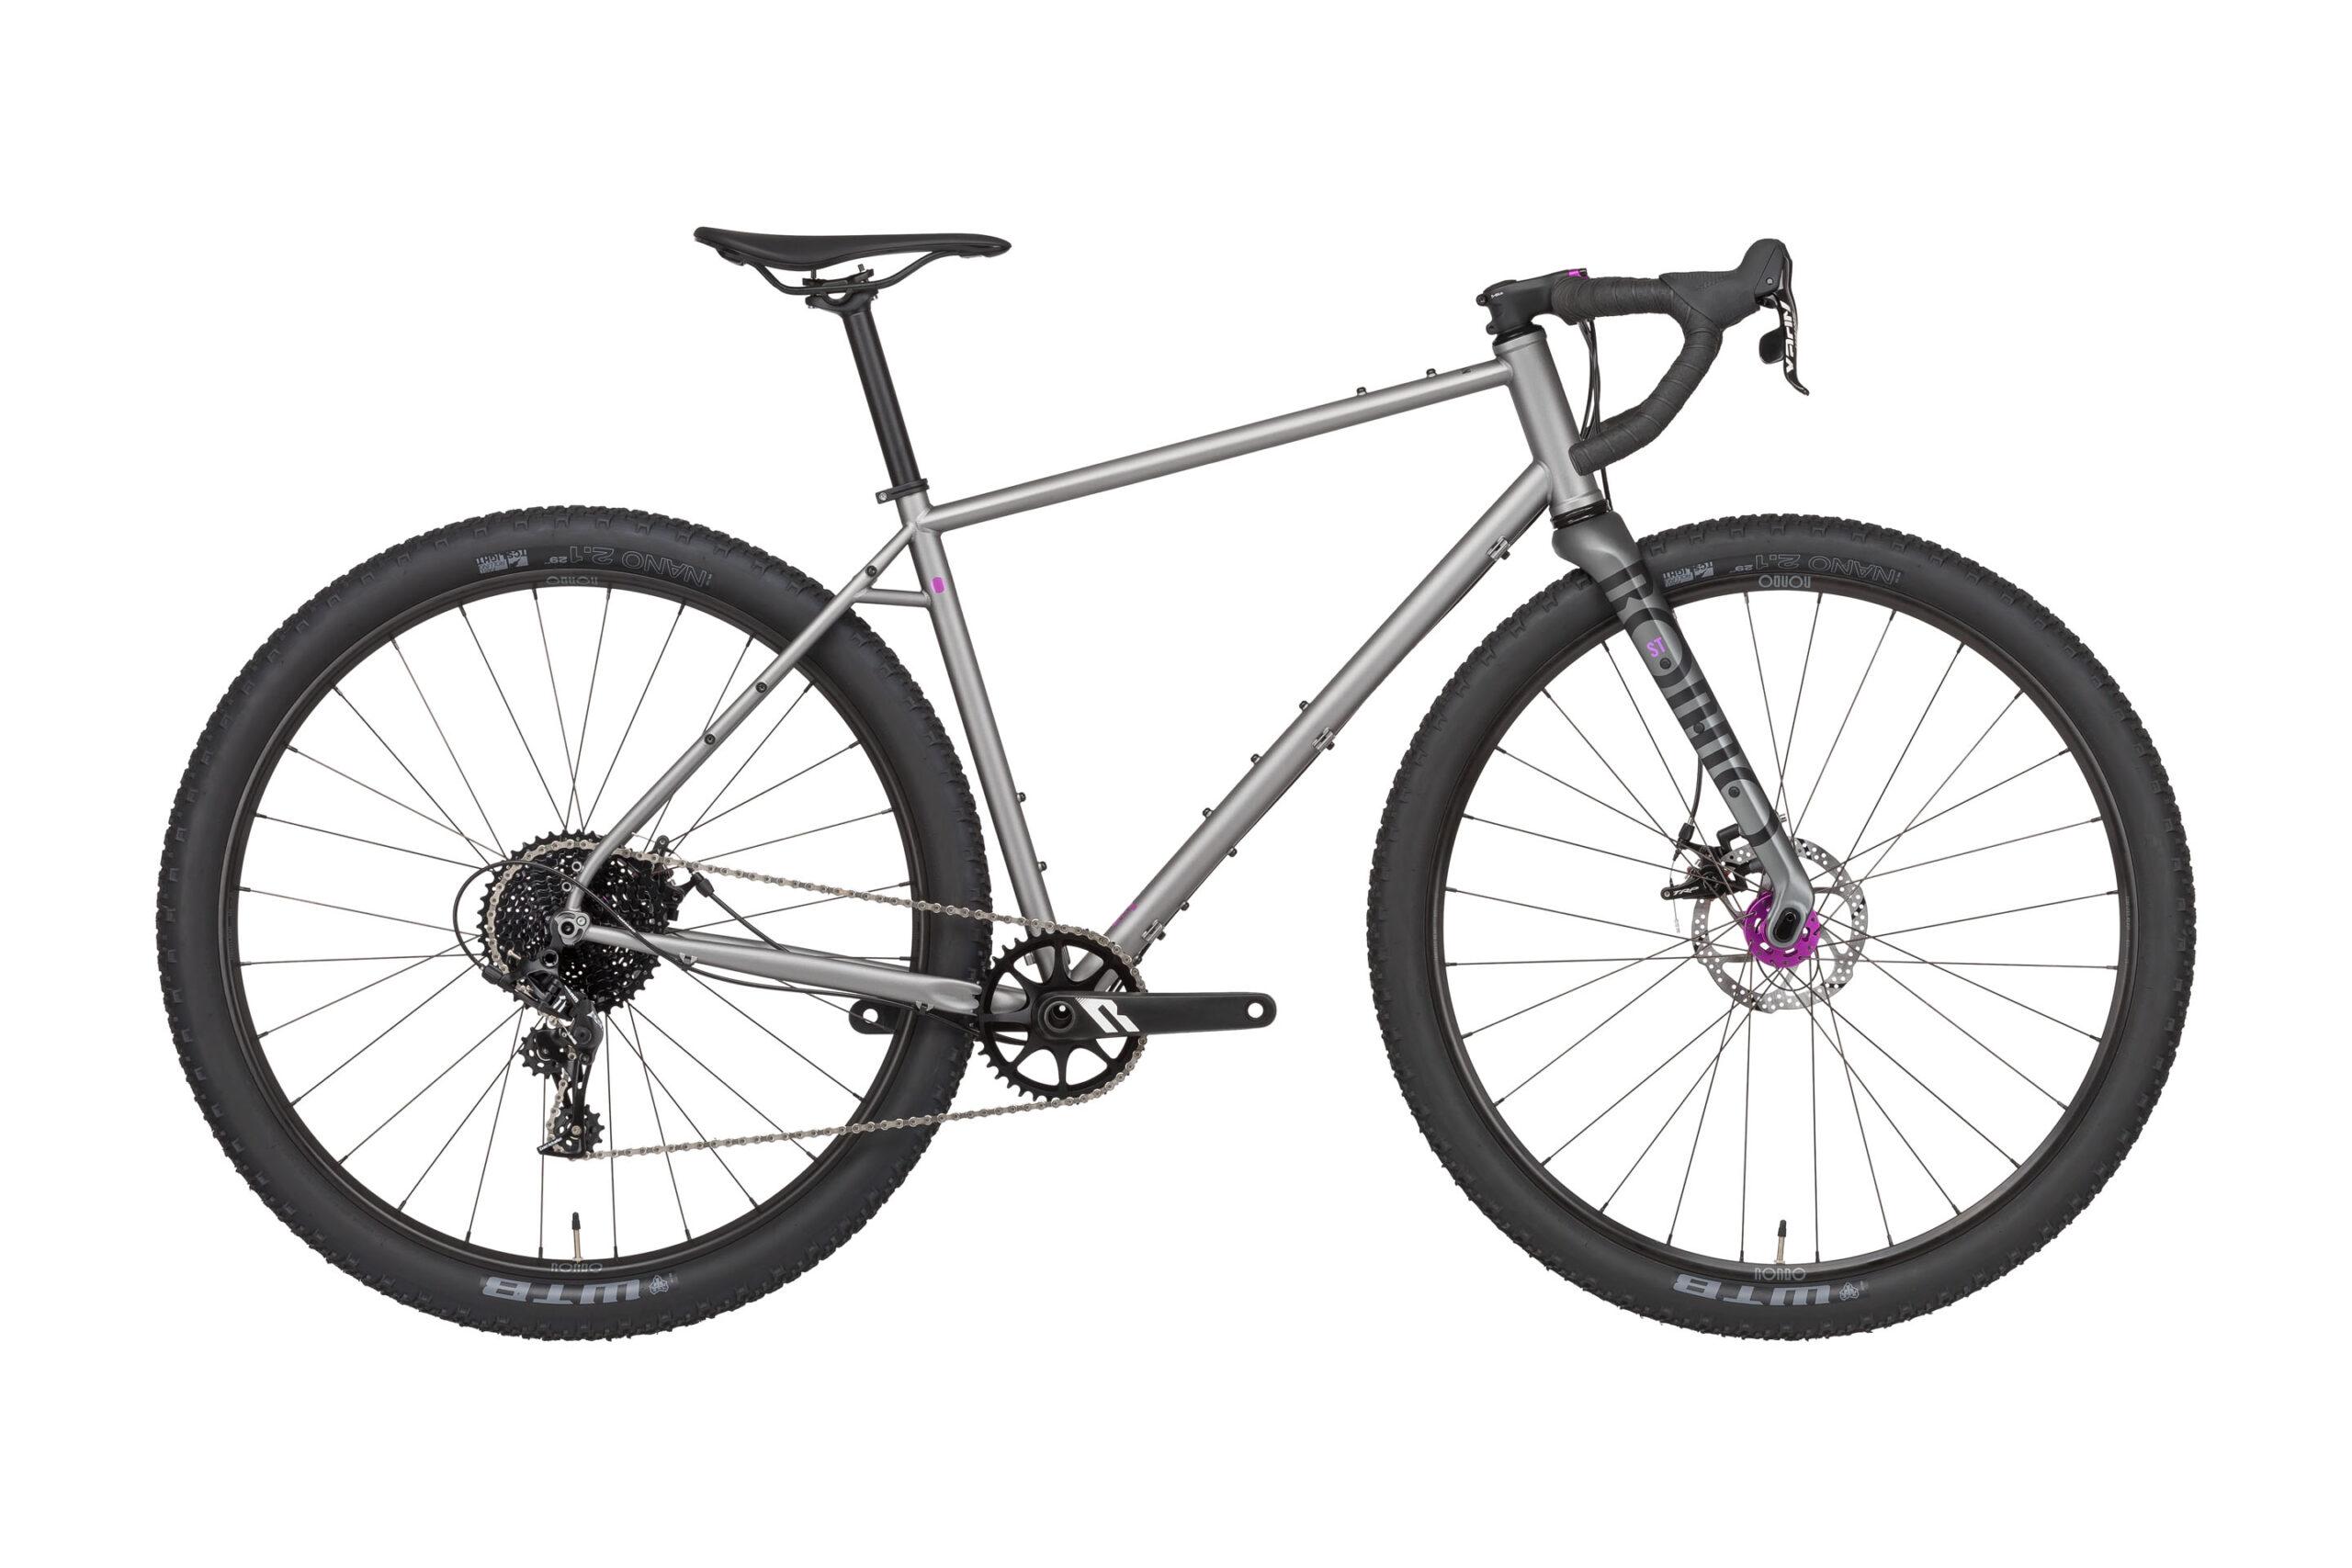 Rondo Bogan - the perfect bike for bikepacking